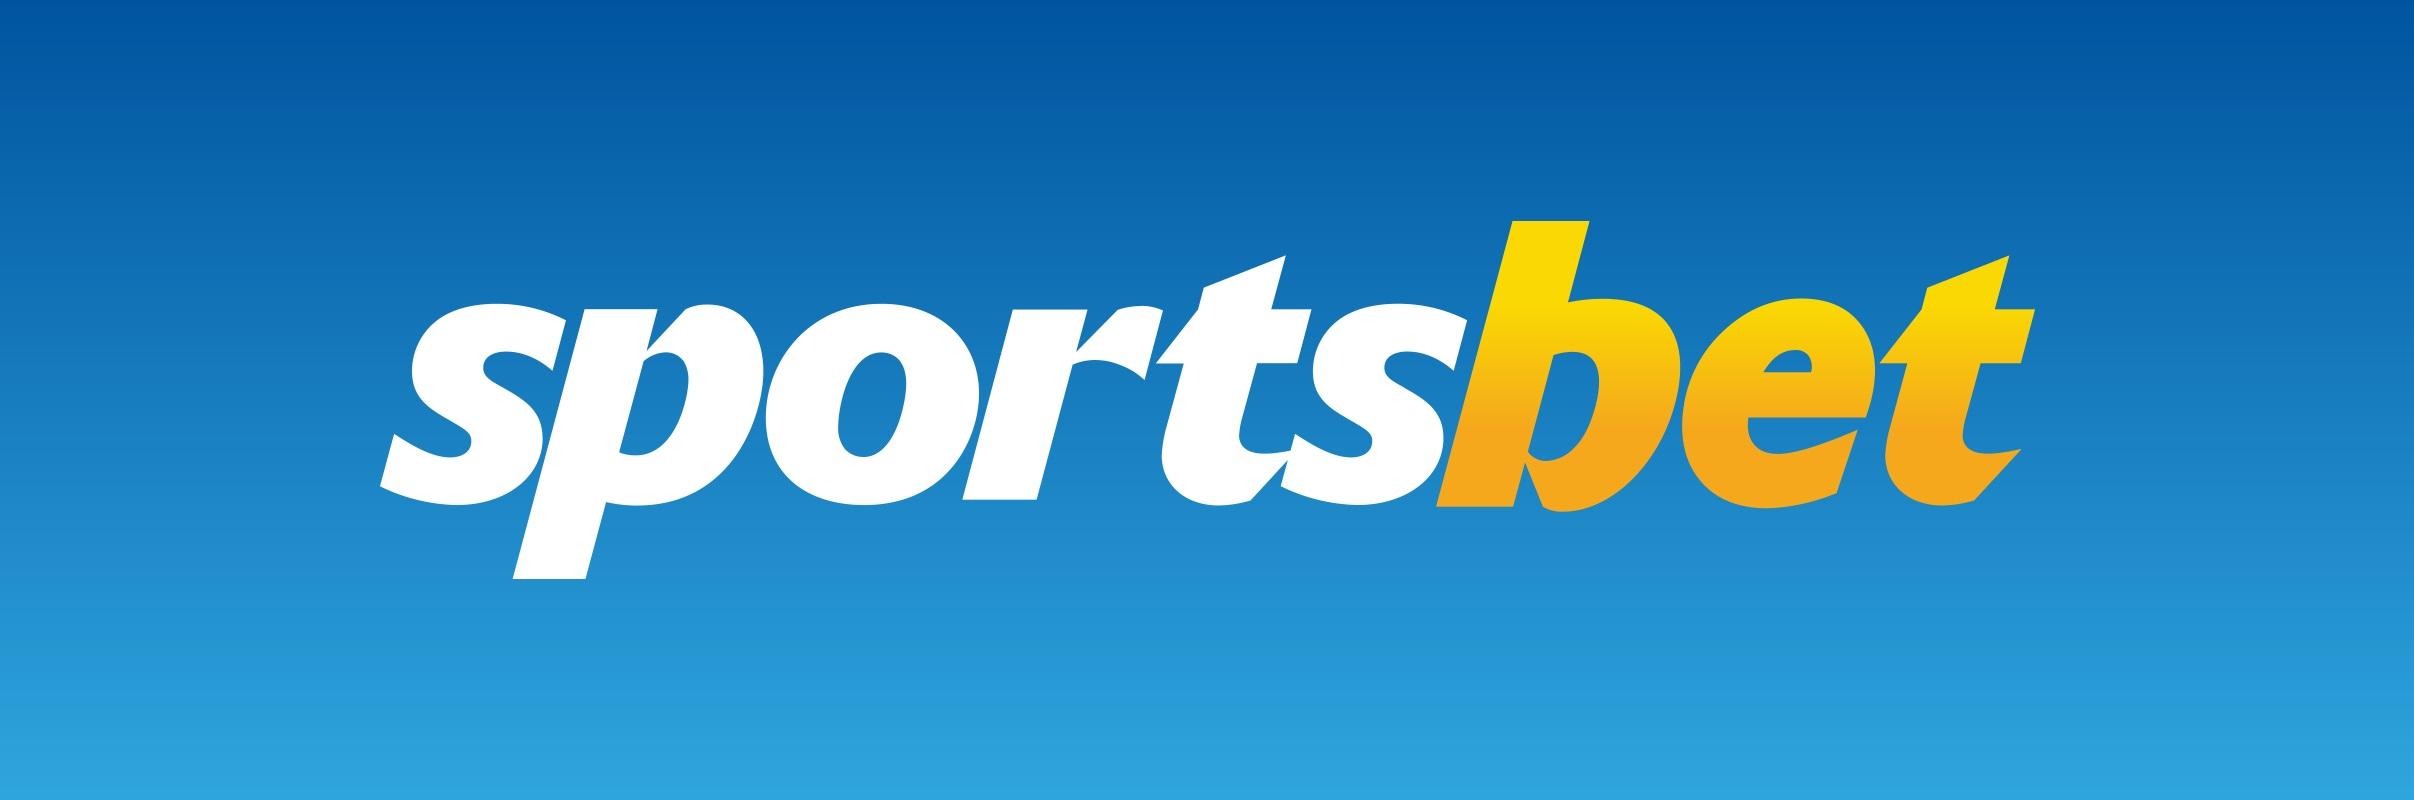 Sportsbet+Logo.jpg